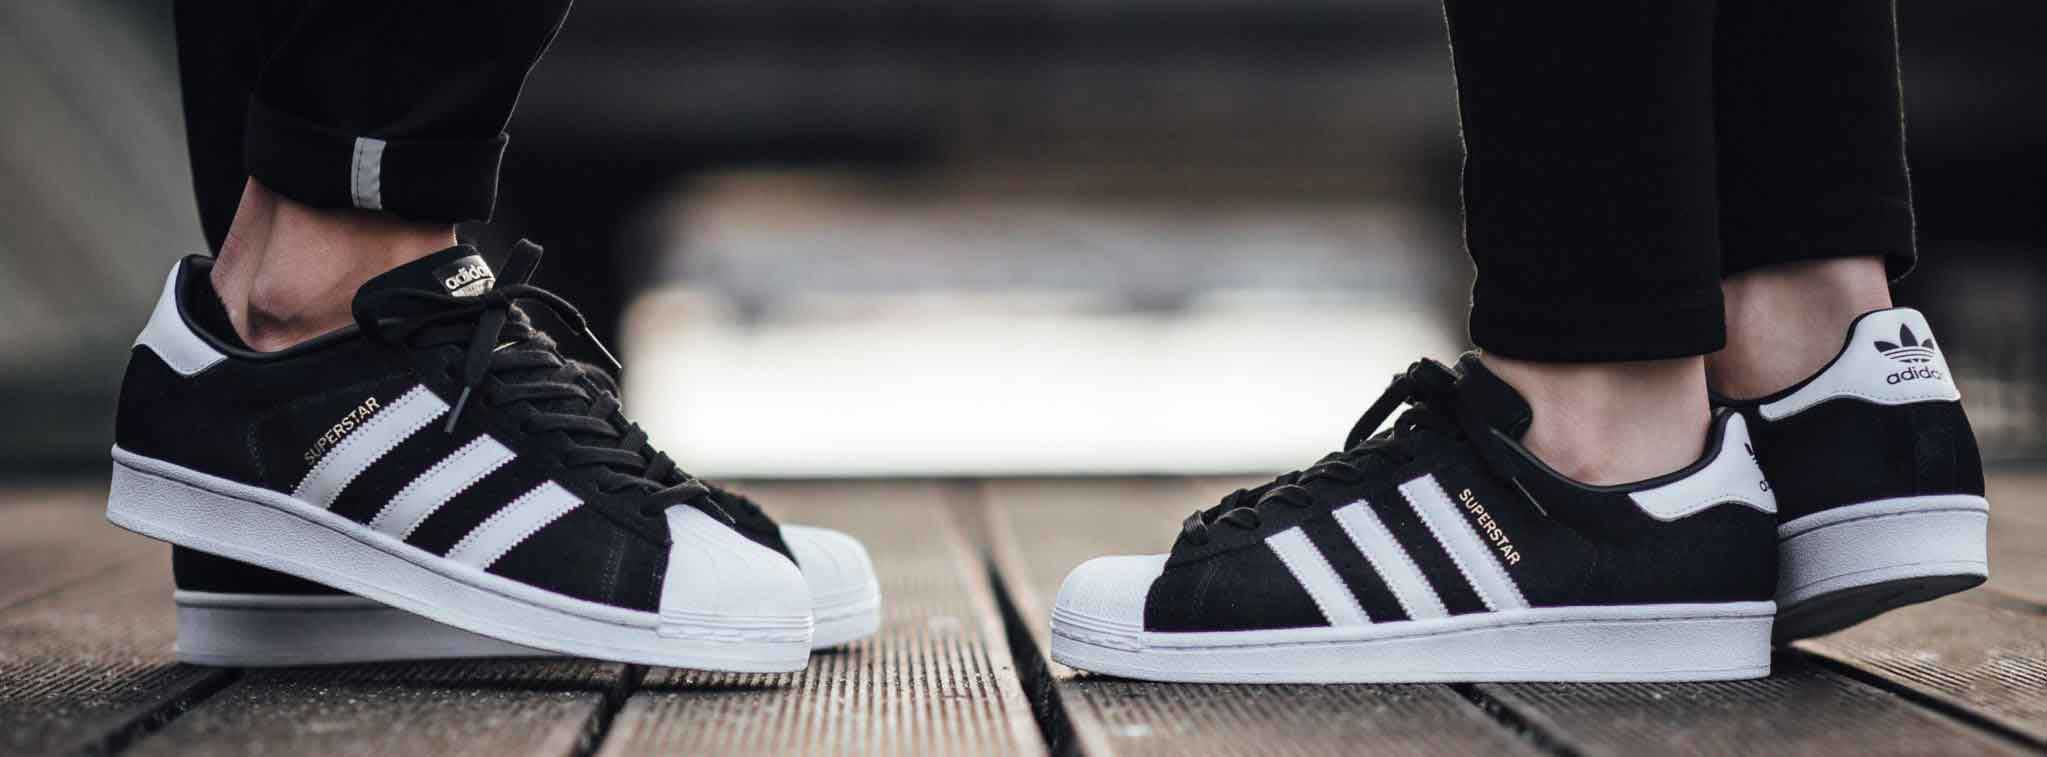 Giầy thể thao nam Adidas